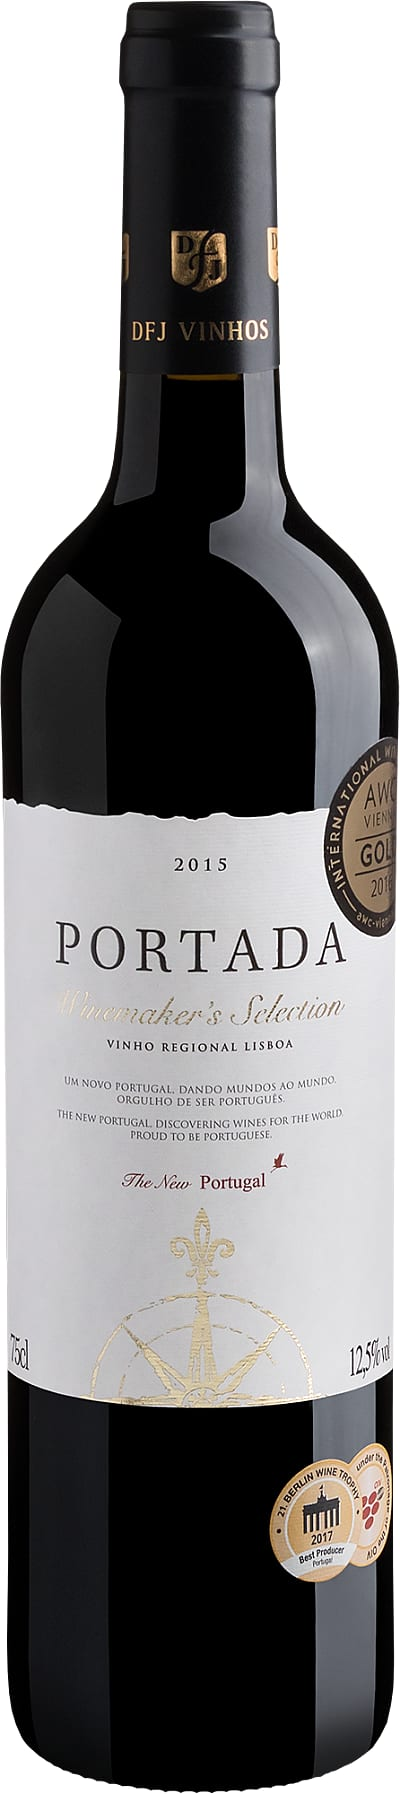 Portada Winemaker's Selection 2015